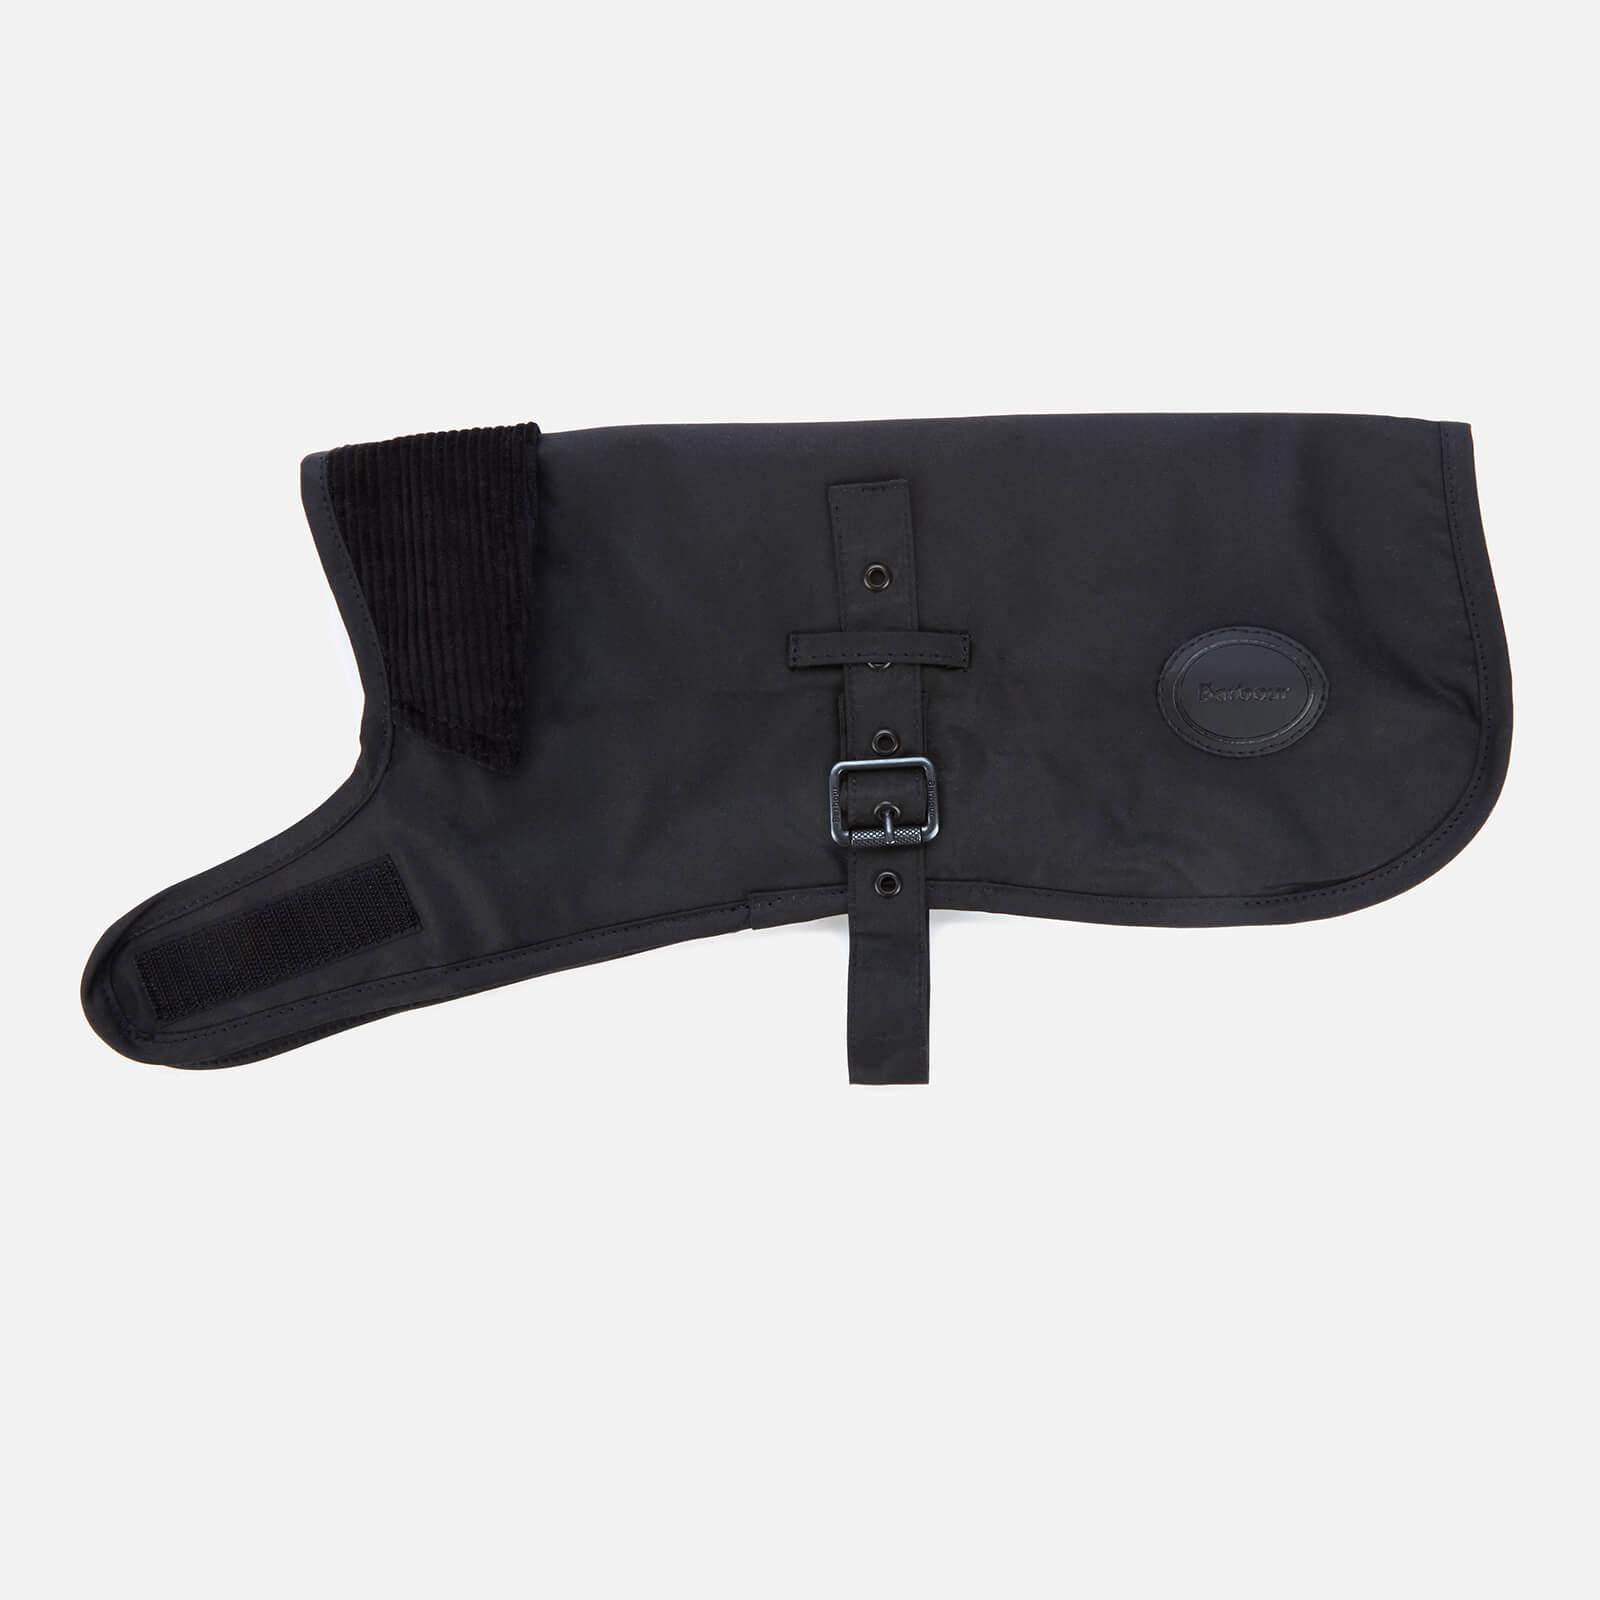 Barbour Casual Matt Wax Dog Coat - Black - S